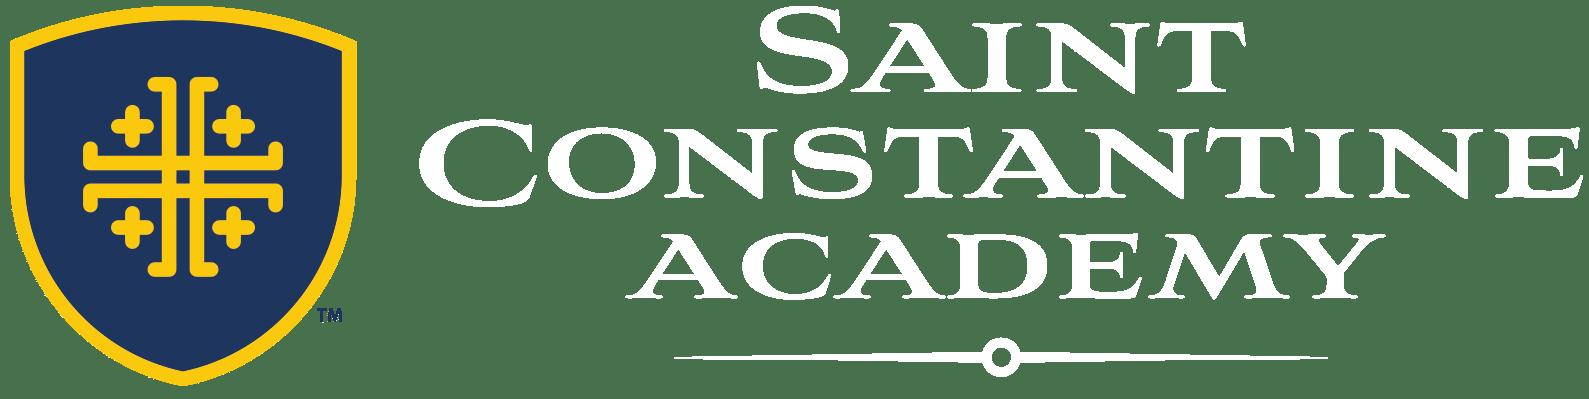 Saint Constantine Academy